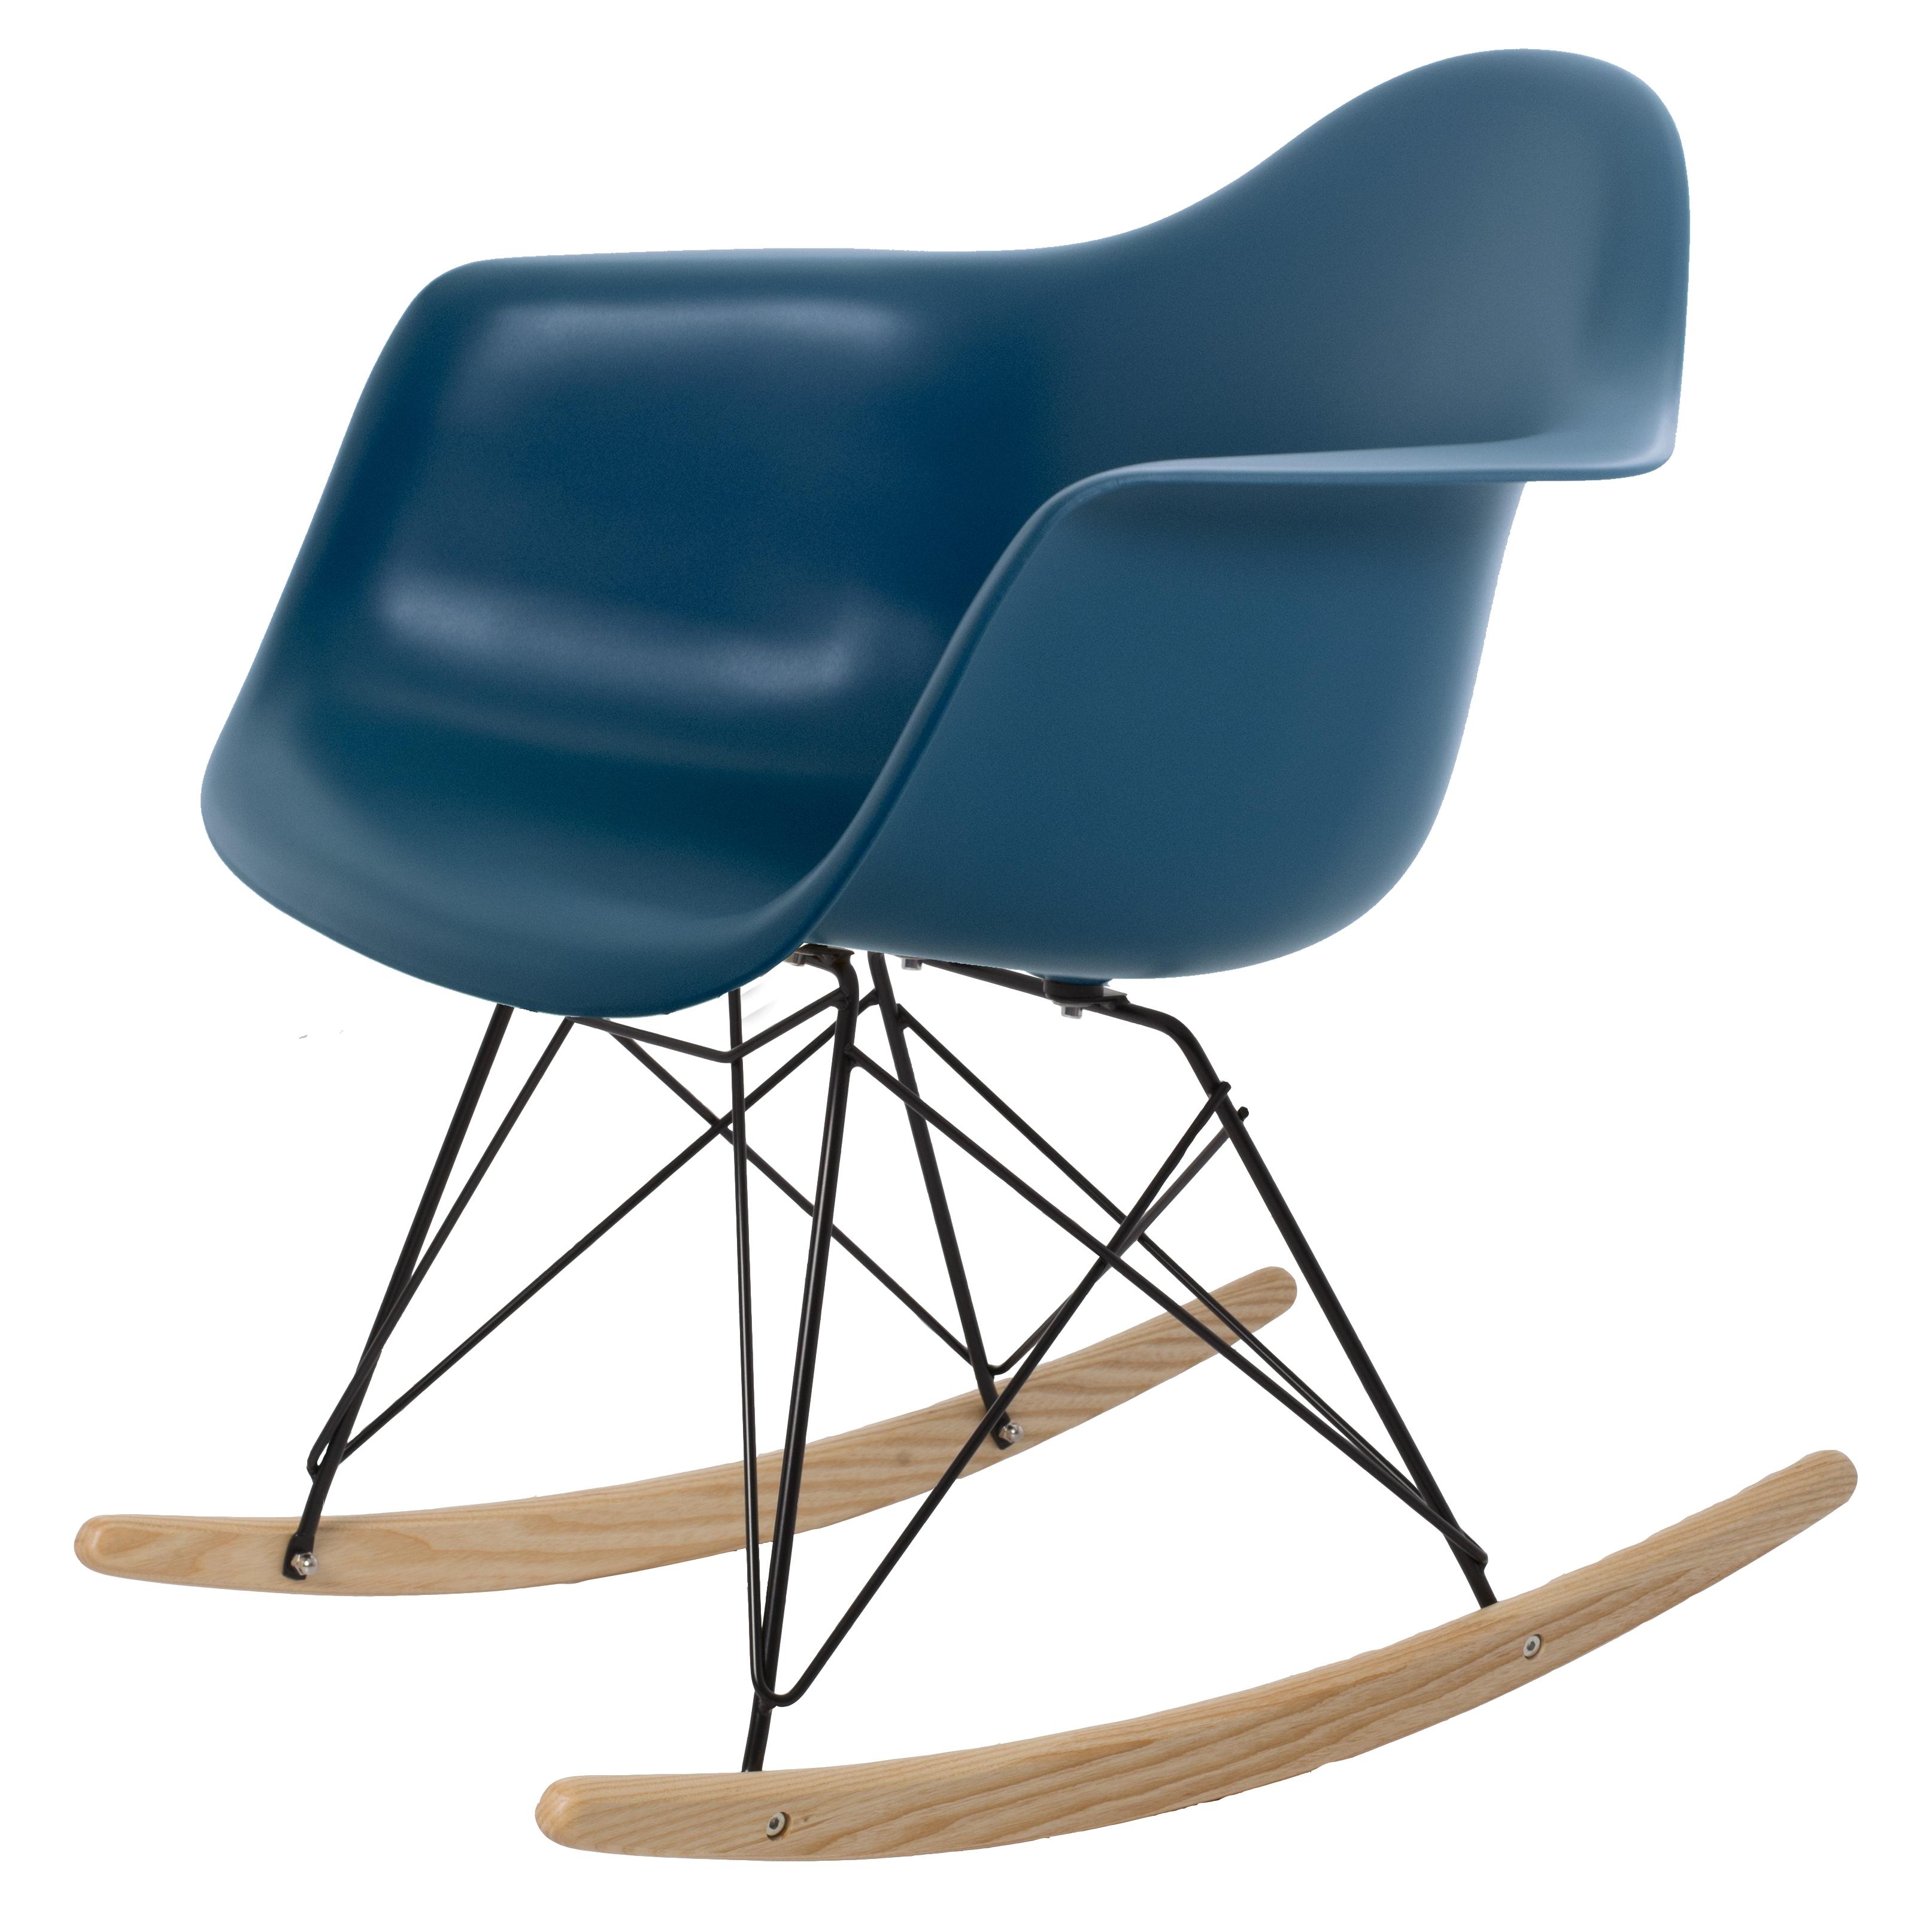 charles eames schaukelstuhl rar base schwartz pp ozeanblau. Black Bedroom Furniture Sets. Home Design Ideas